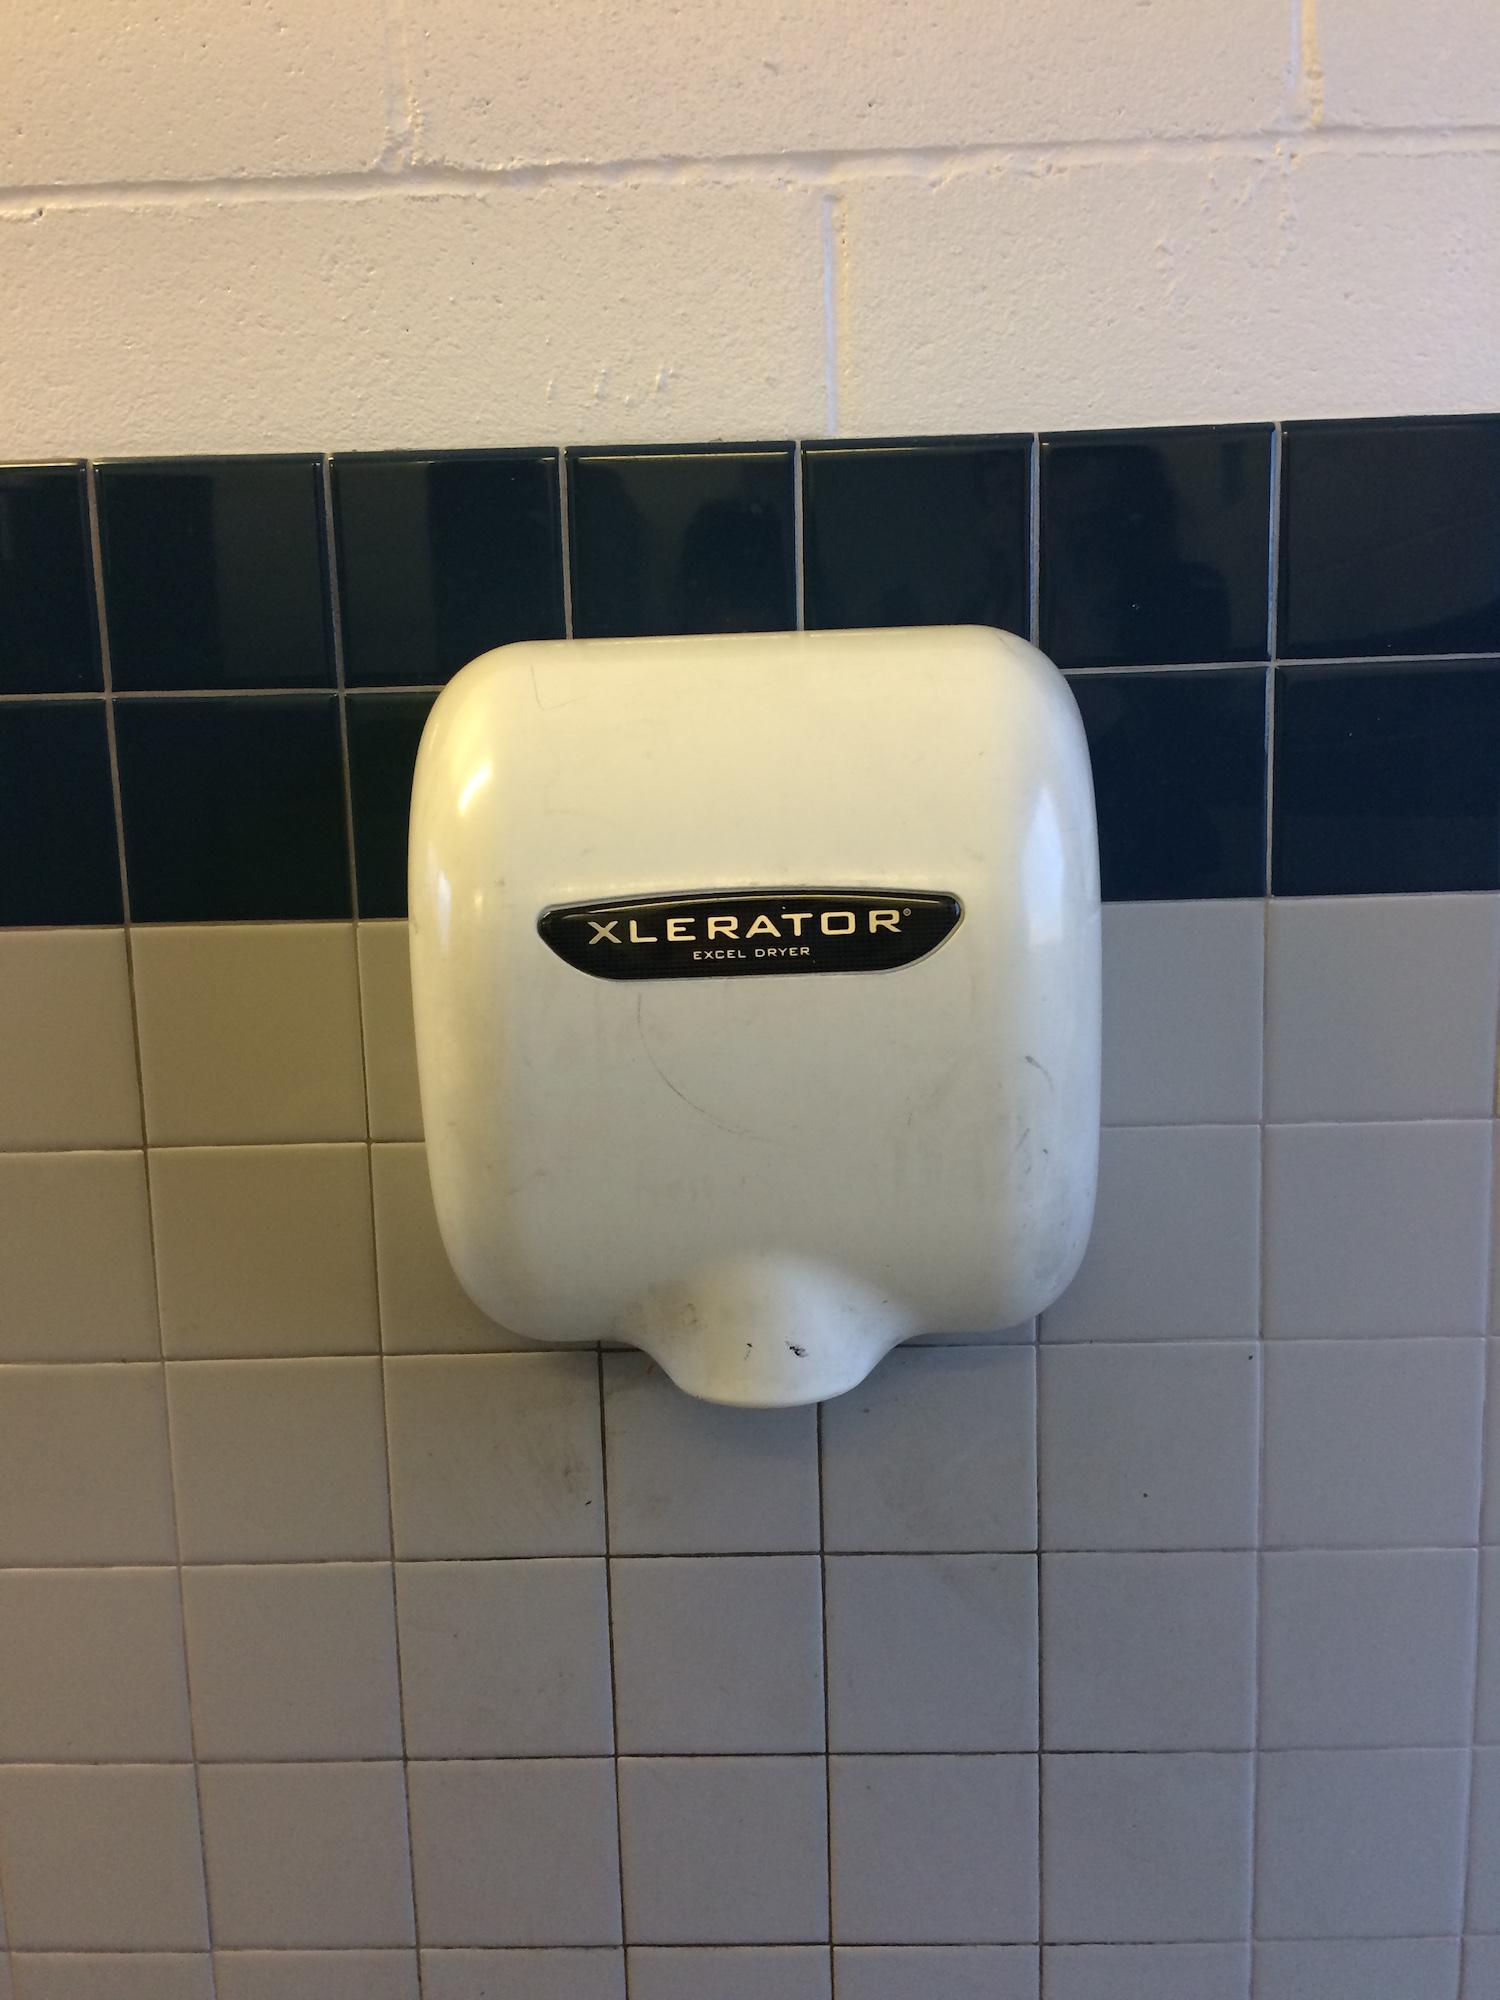 Observations Design For Public Restrooms - Hand blower for bathroom